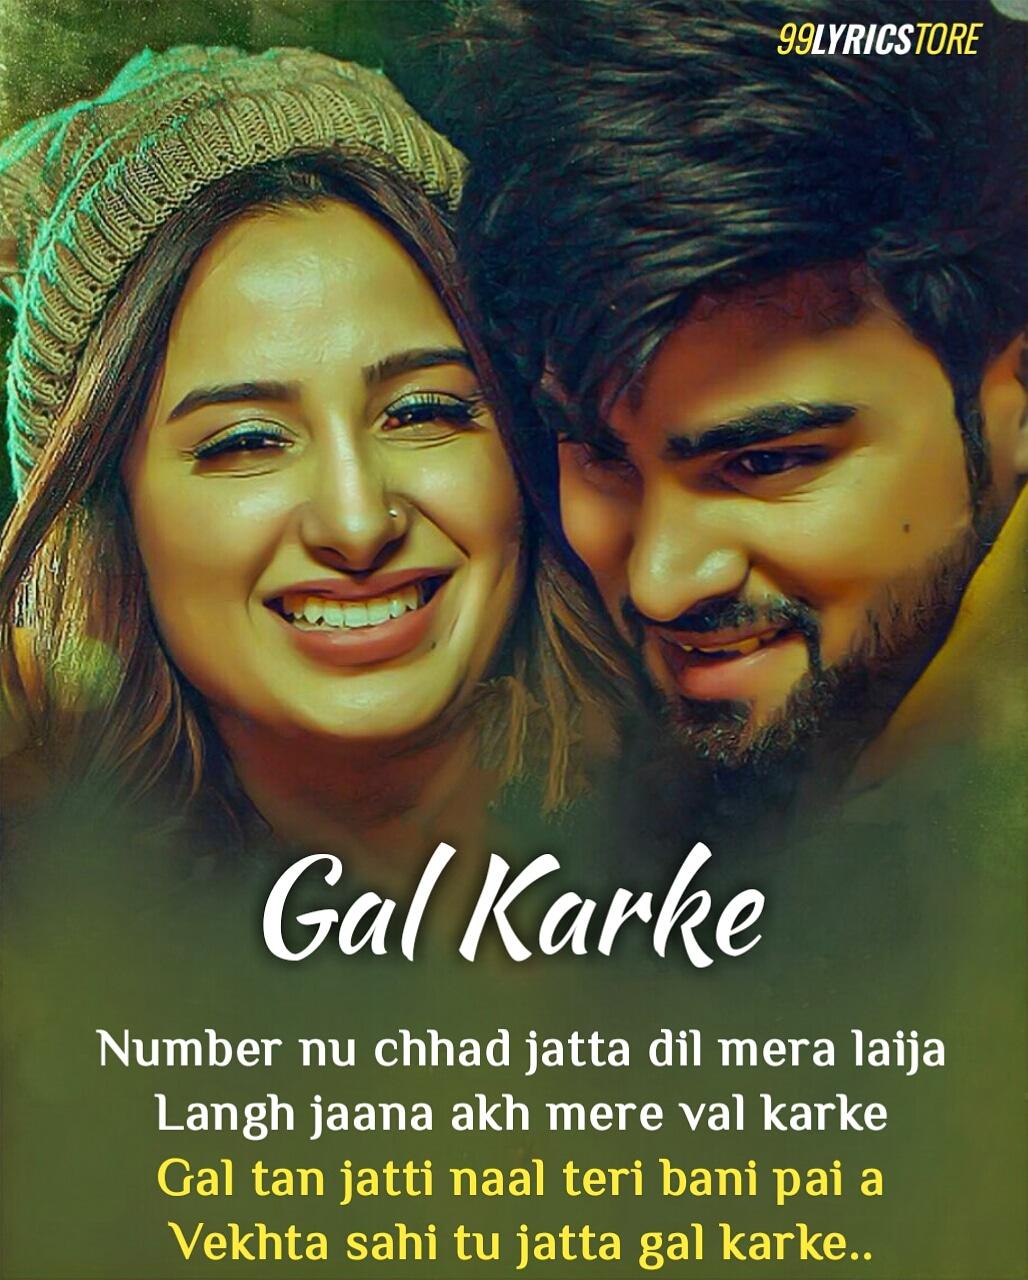 Gal Karke Lyrics Punjabi Song Sung by Inder Chahal Ft. mahira Sharma